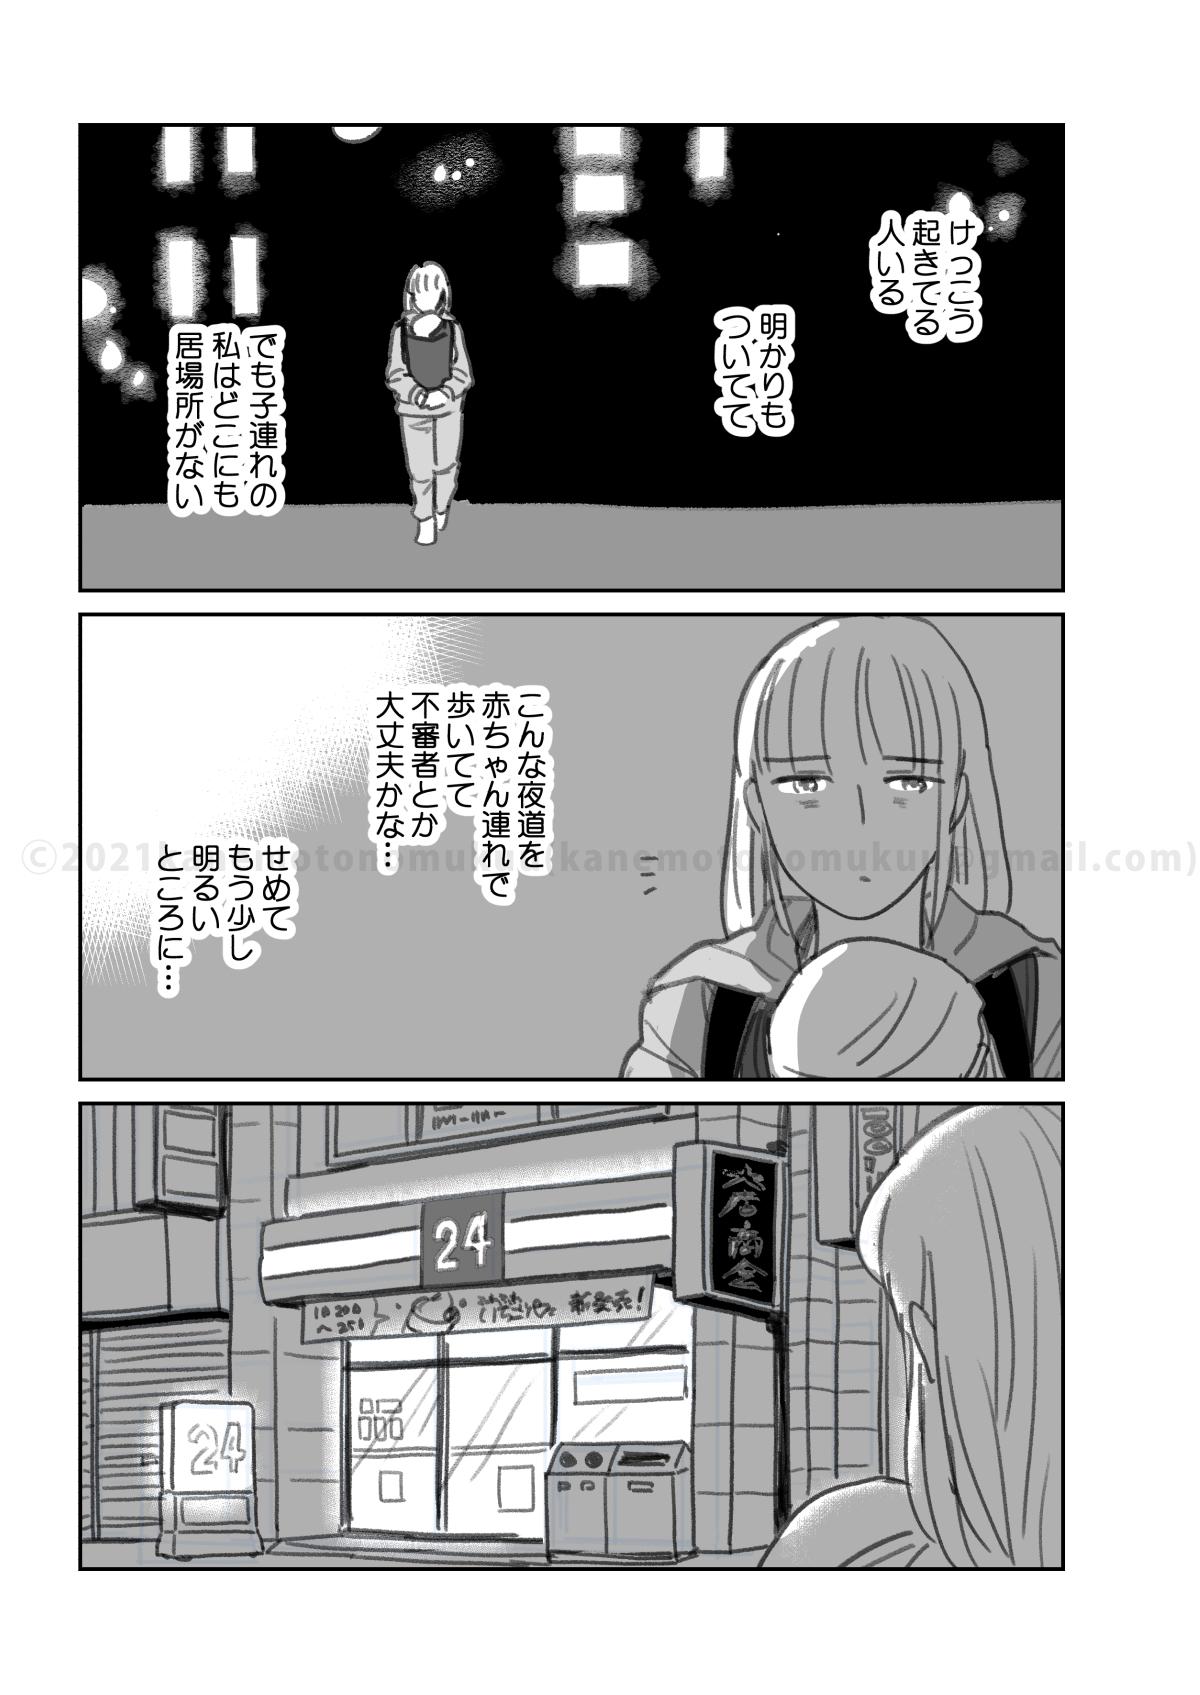 f:id:kanemotonomukuu:20210319175008j:plain